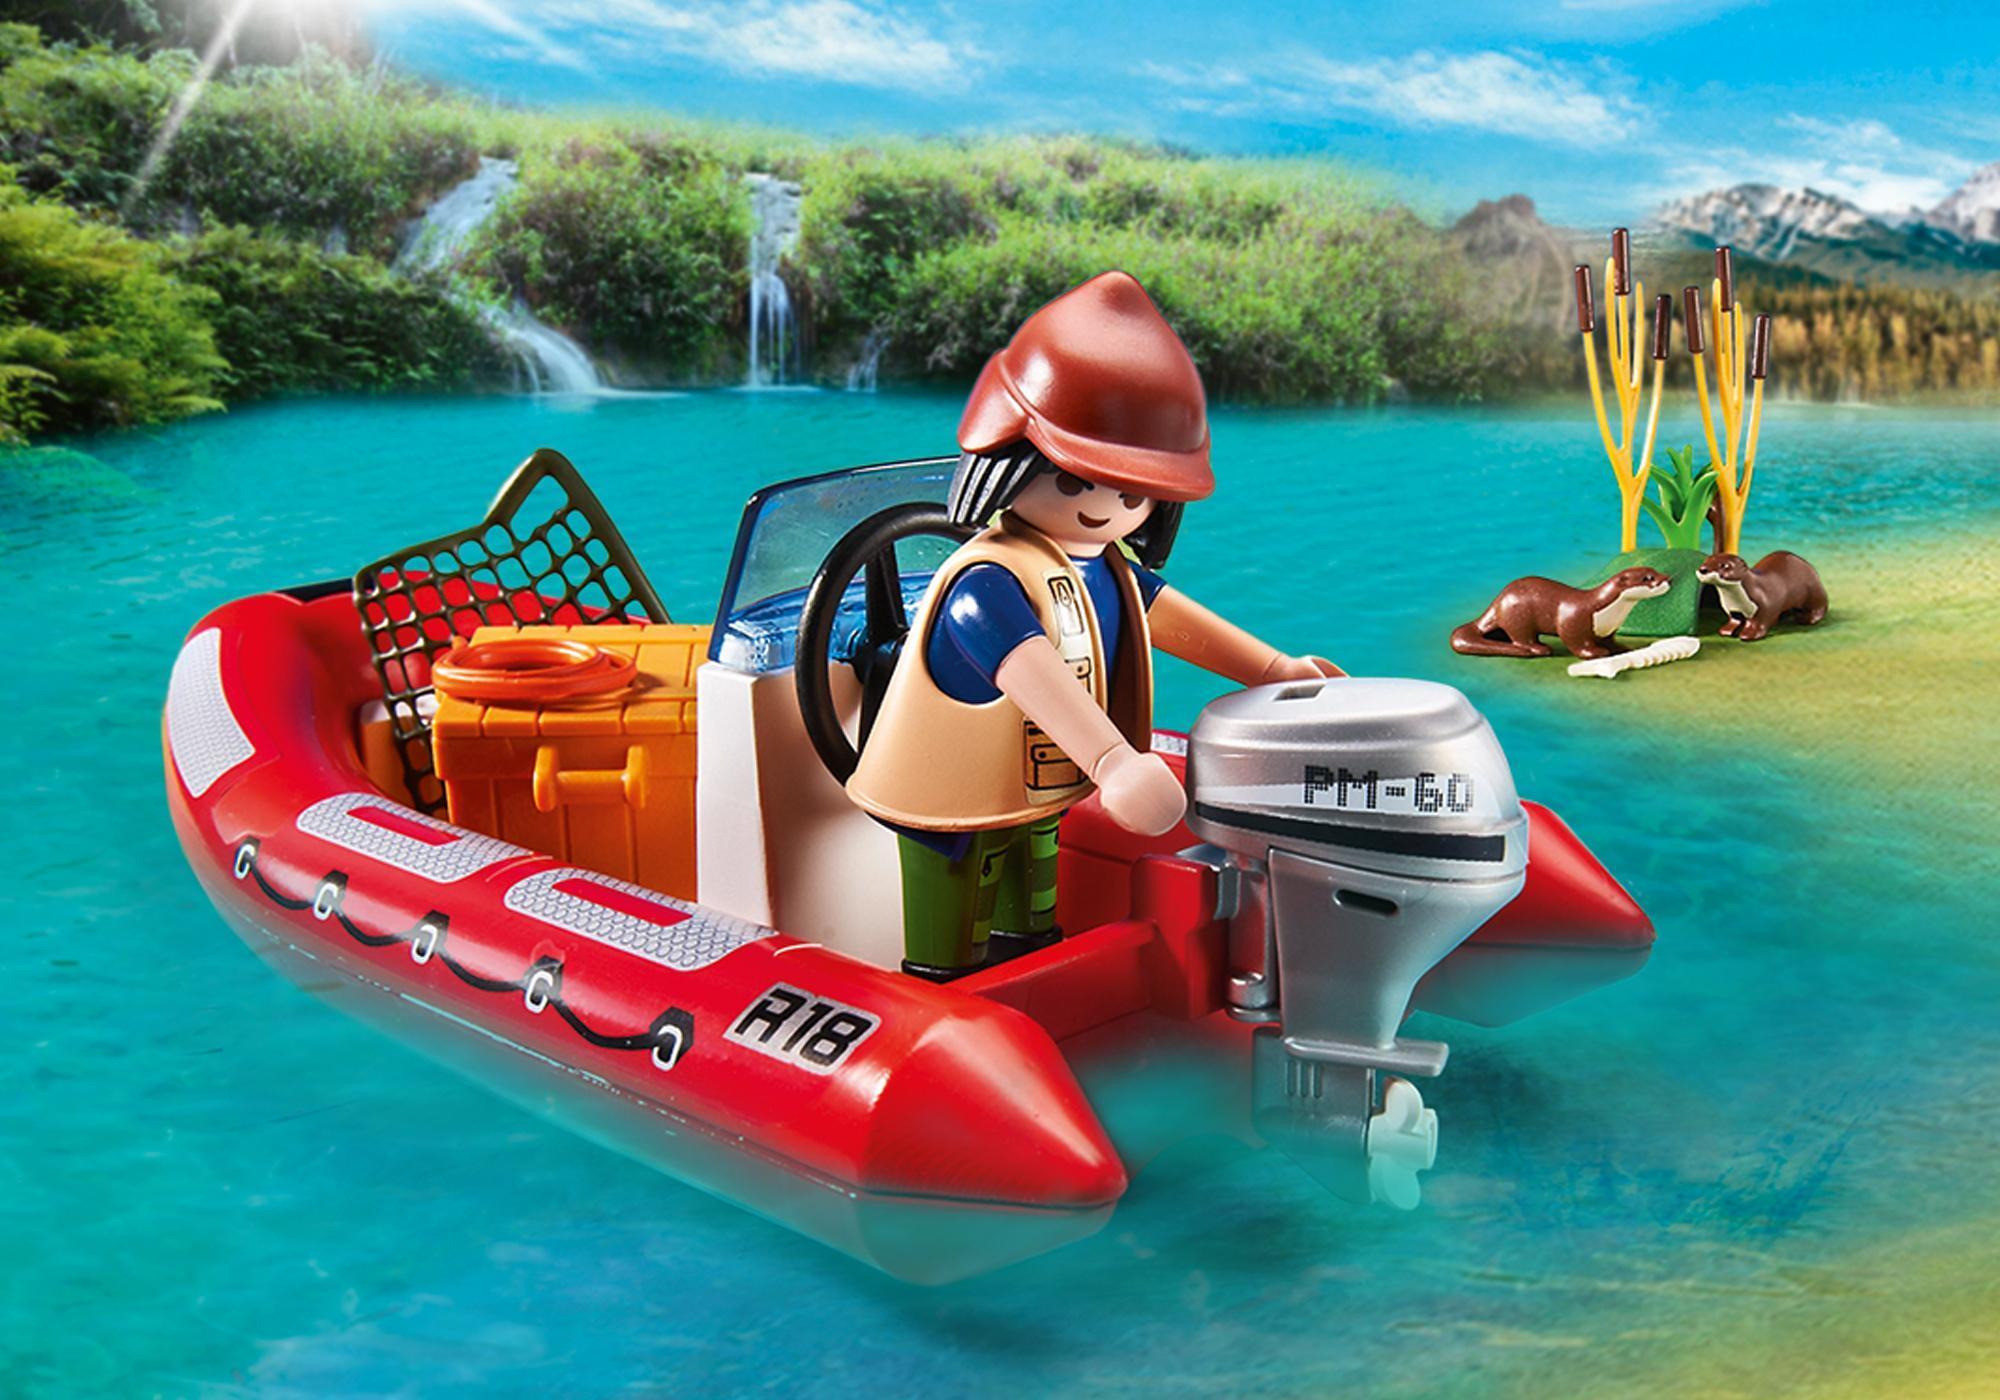 http://media.playmobil.com/i/playmobil/5559_product_extra2/Gommone-avventura con esploratori